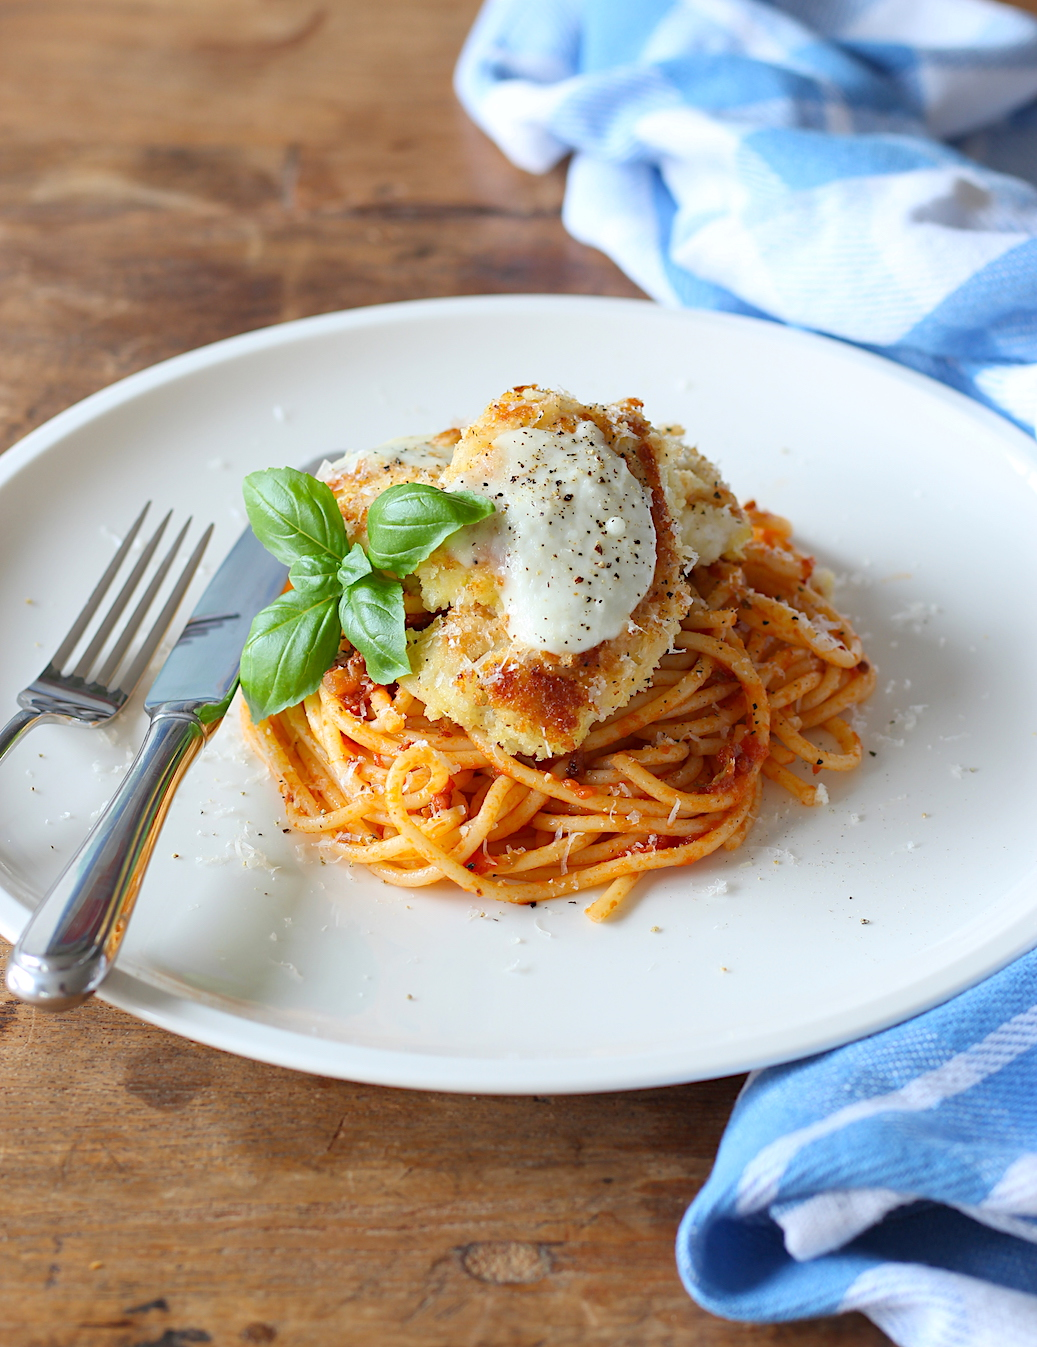 pollo-alla-parmigiana-met-spaghetti-4